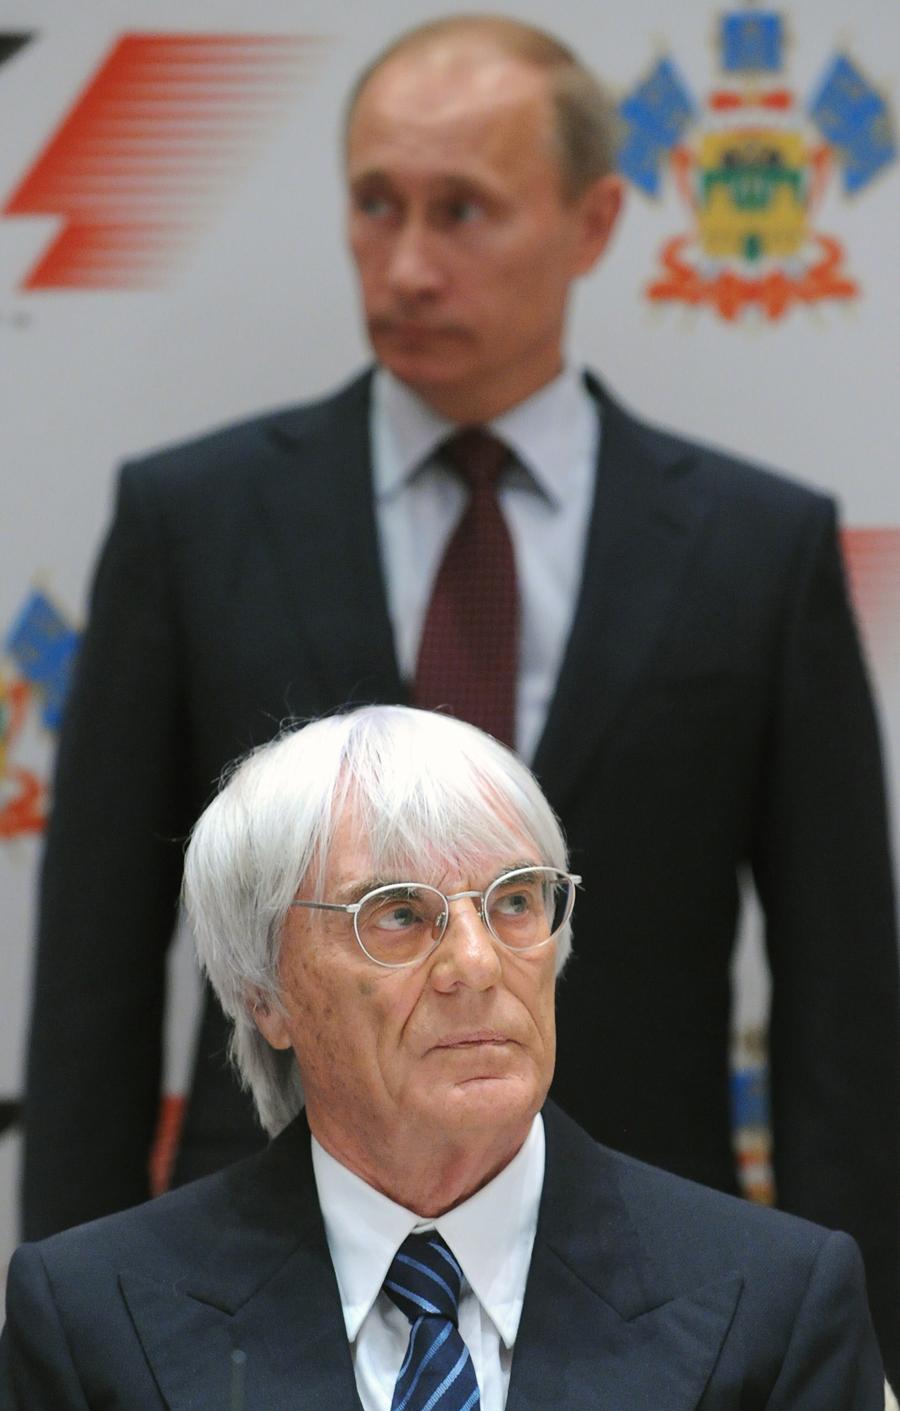 Bernie Ecclestone and Russian Prime Minister Vladimir Putin attend a ceremony